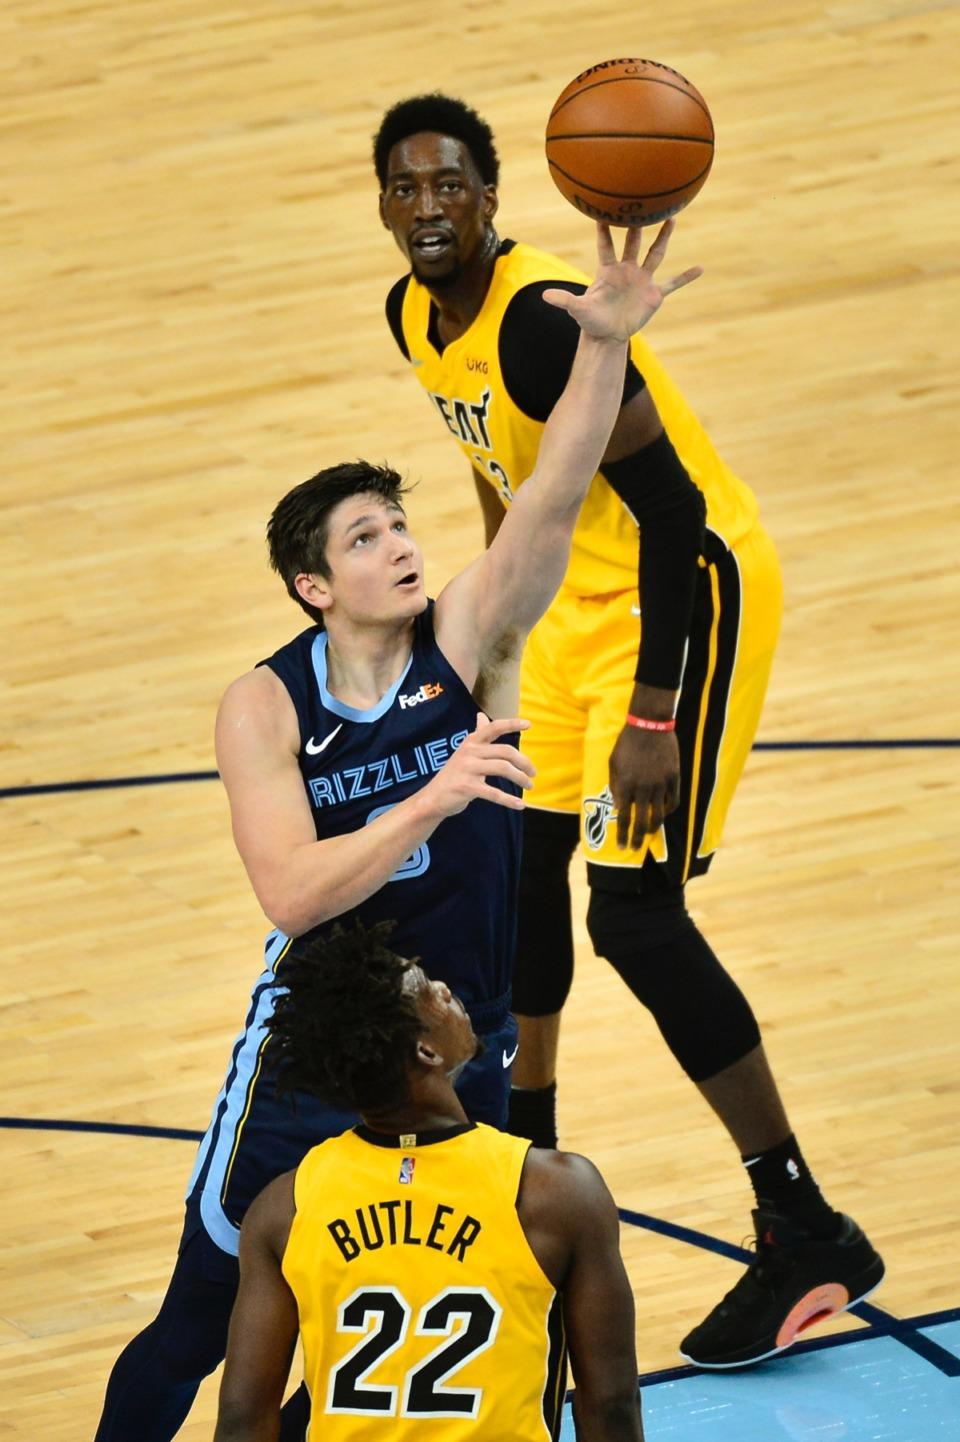 <strong>Memphis Grizzlies guard Grayson Allen shoots between Miami Heat forward Jimmy Butler (22) and center Bam Adebayo&nbsp;on March 17, 2021, at FedExForum.</strong> (Brandon Dill/AP)